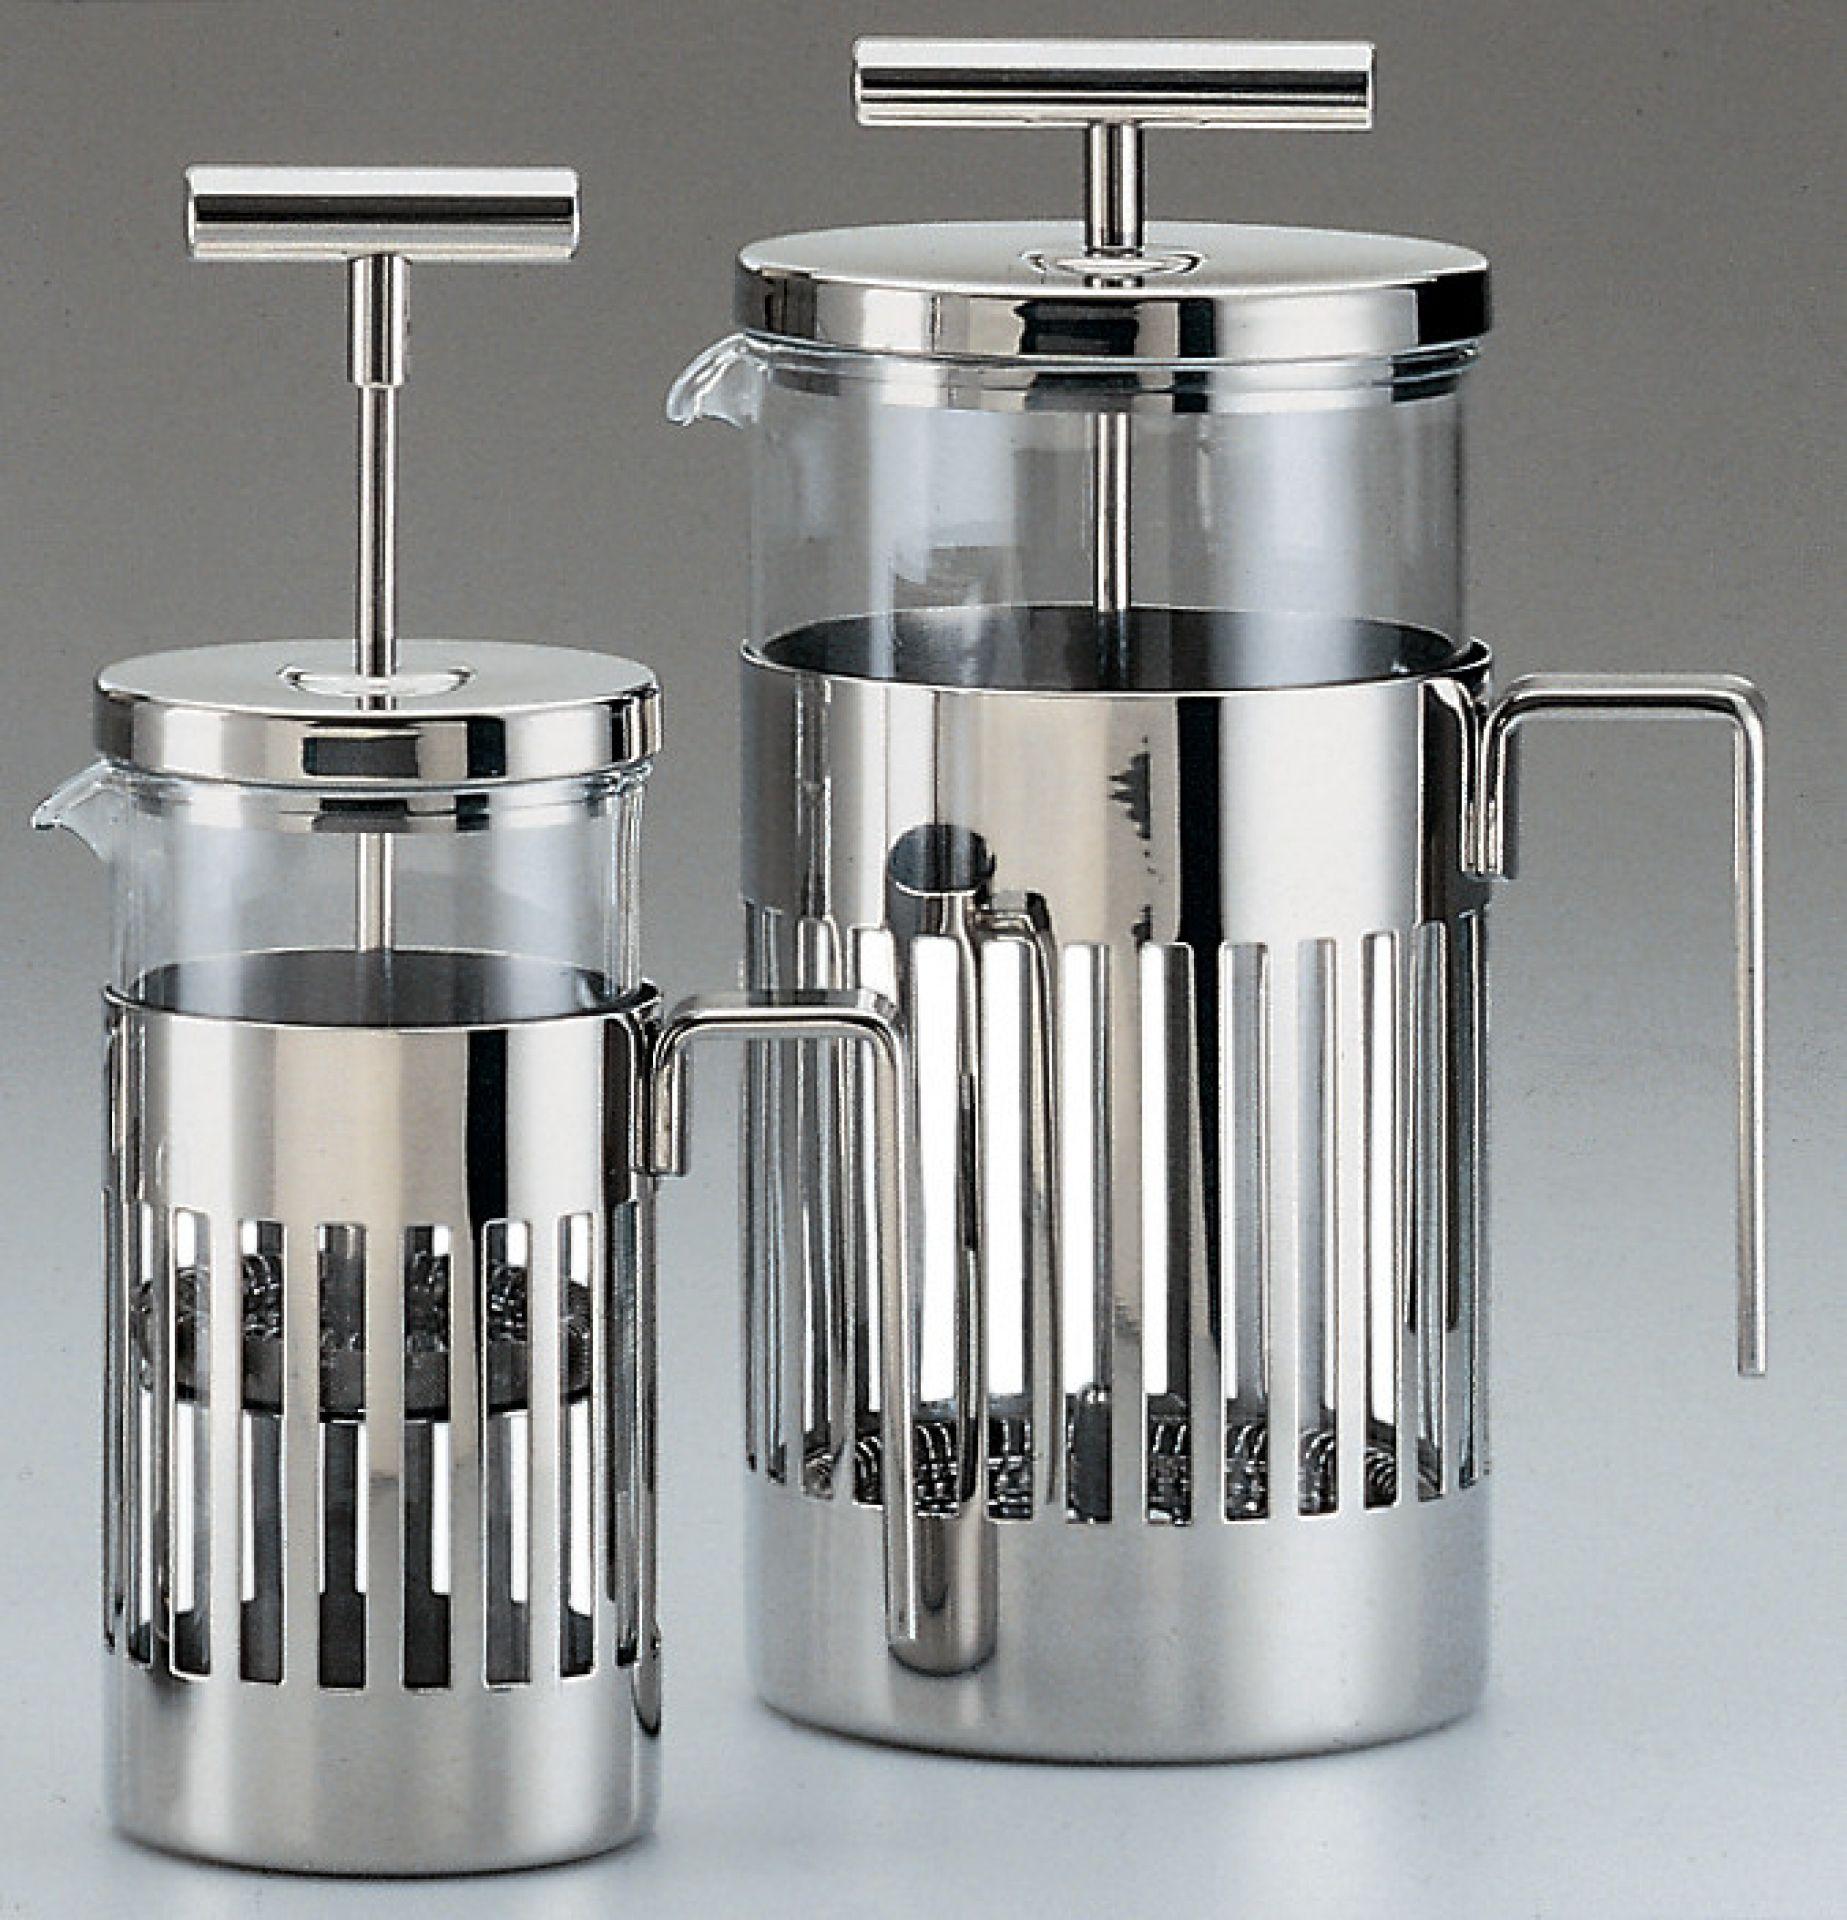 9094 Press filter jug Alessi 3 cups